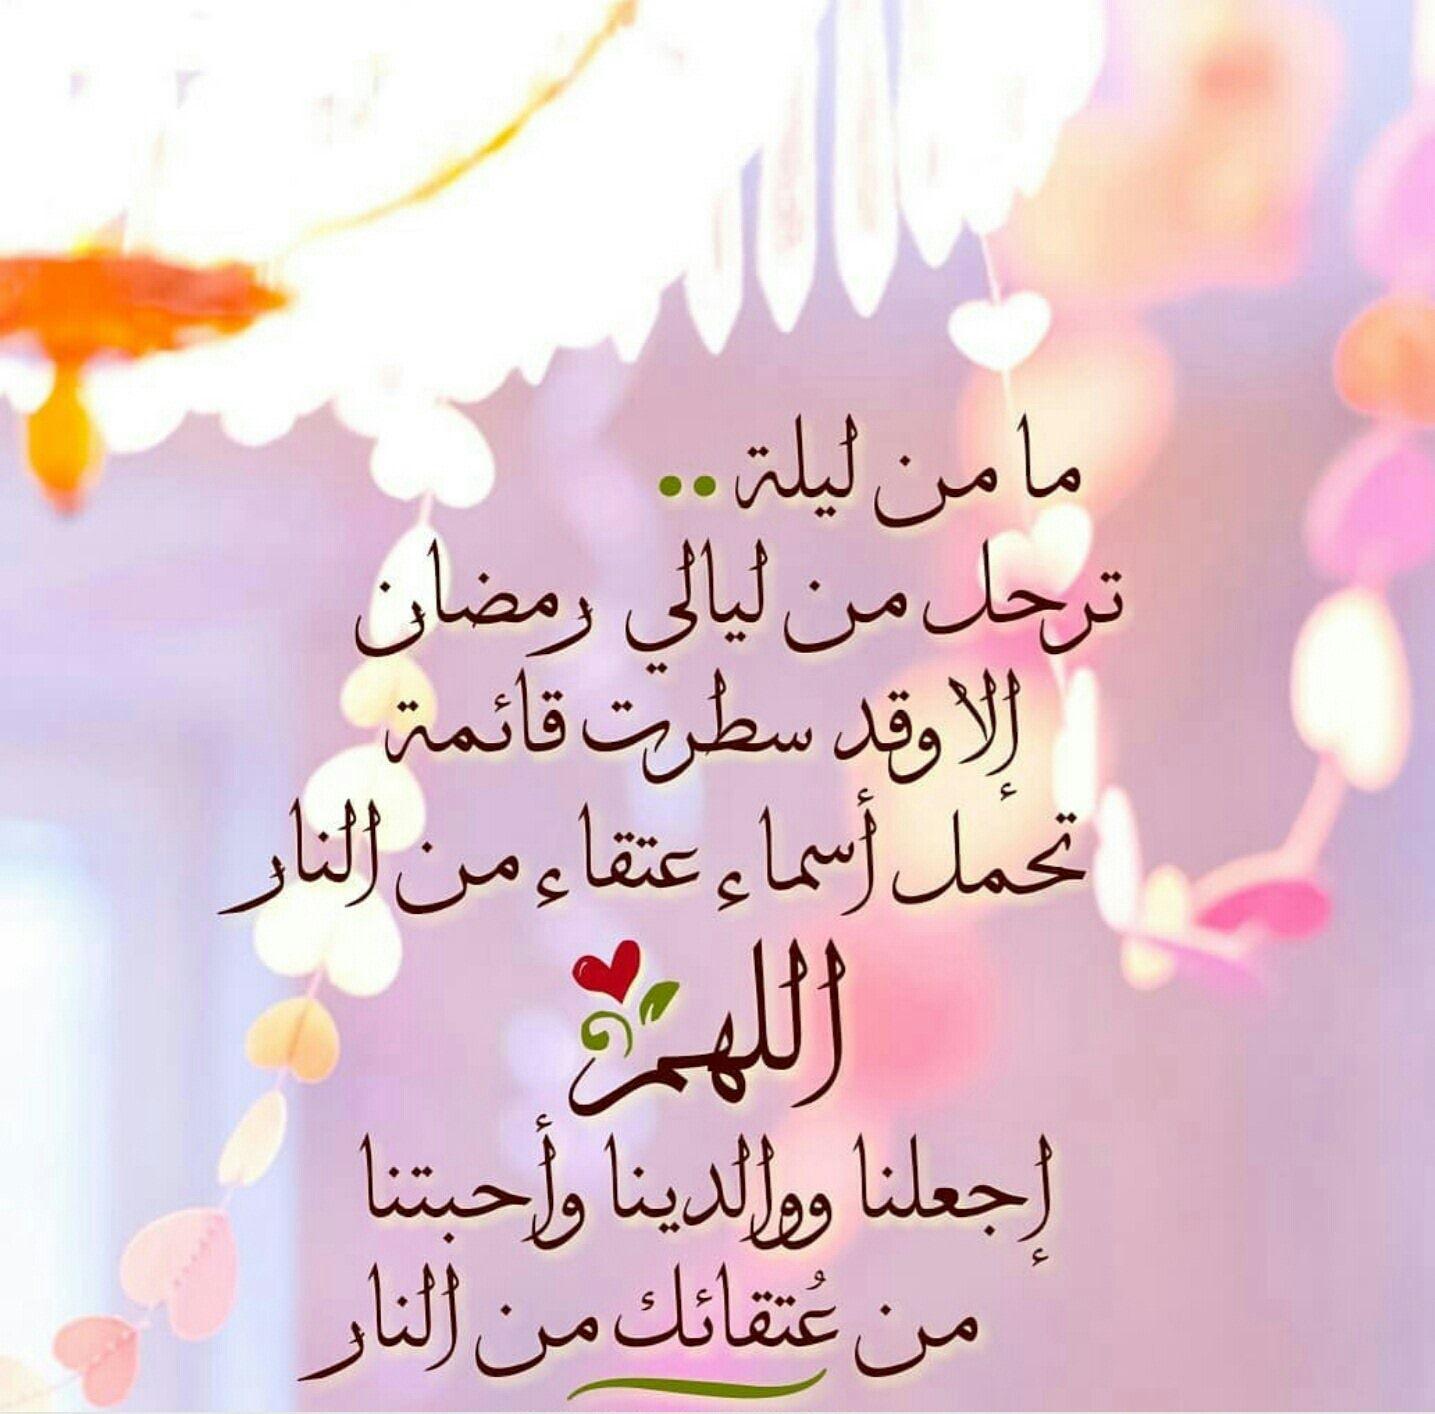 Pin By هبة الرحمن On رمضان كريم Ramadan Kareem In 2020 Ramadan Lantern Islamic Quotes Wallpaper Islam Facts